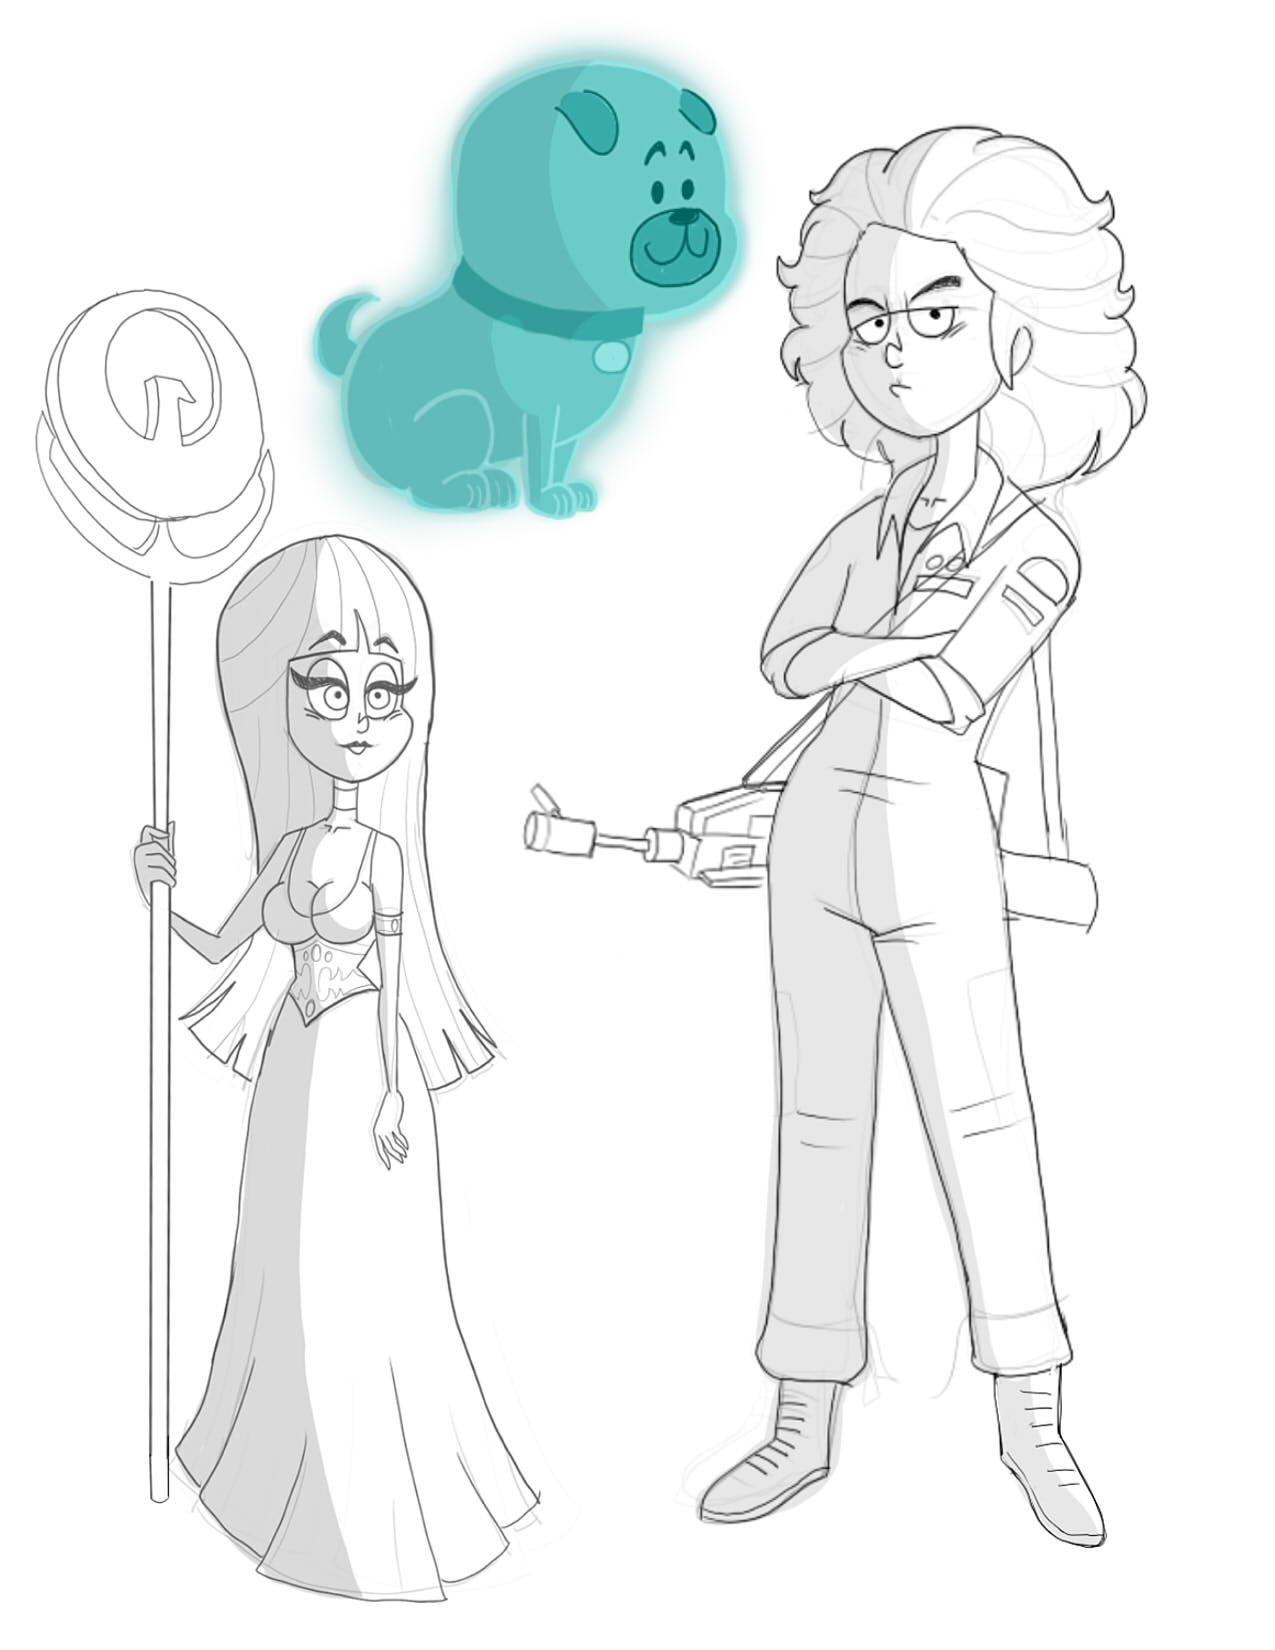 random sketches 193.jpg